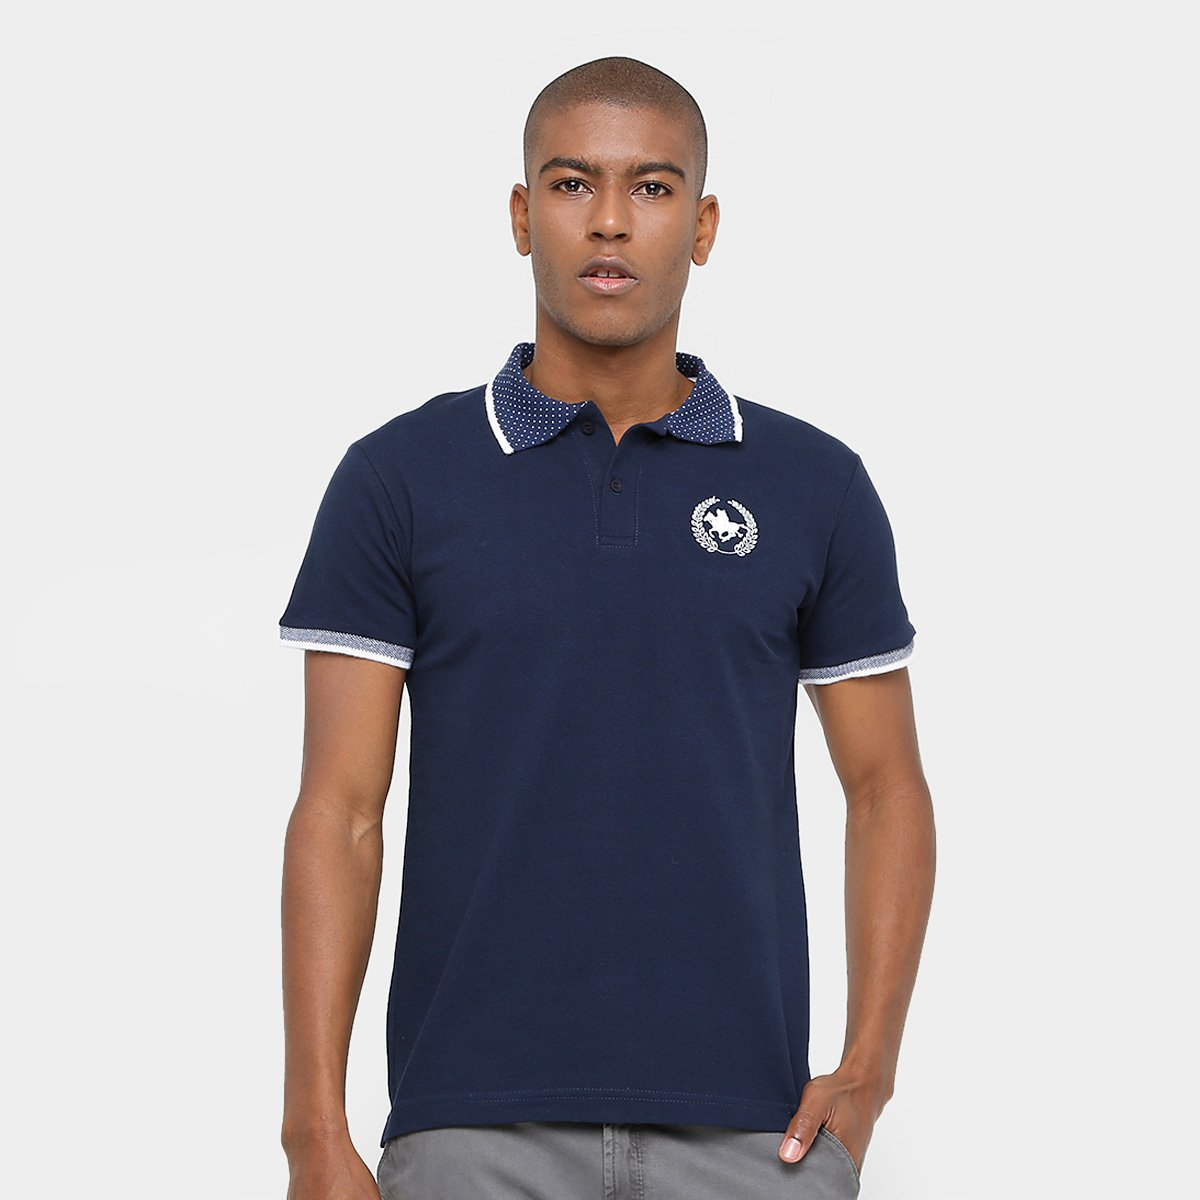 2c7489c0db067 Camisa Polo Rg 518 Gola Poá Masculina